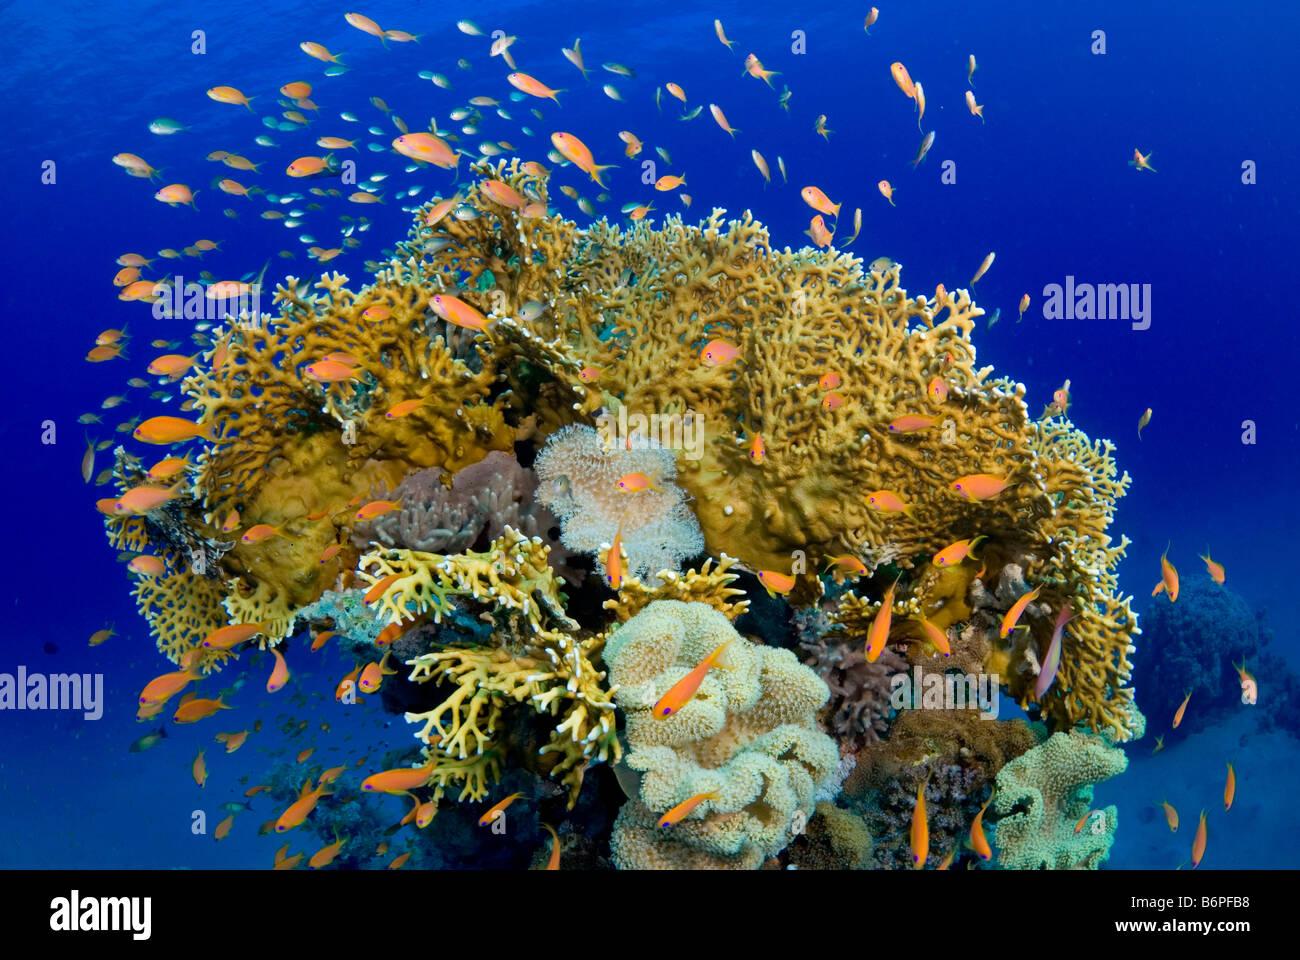 Marsa Abu Dabbab, Egypt, Red Sea - Stock Image